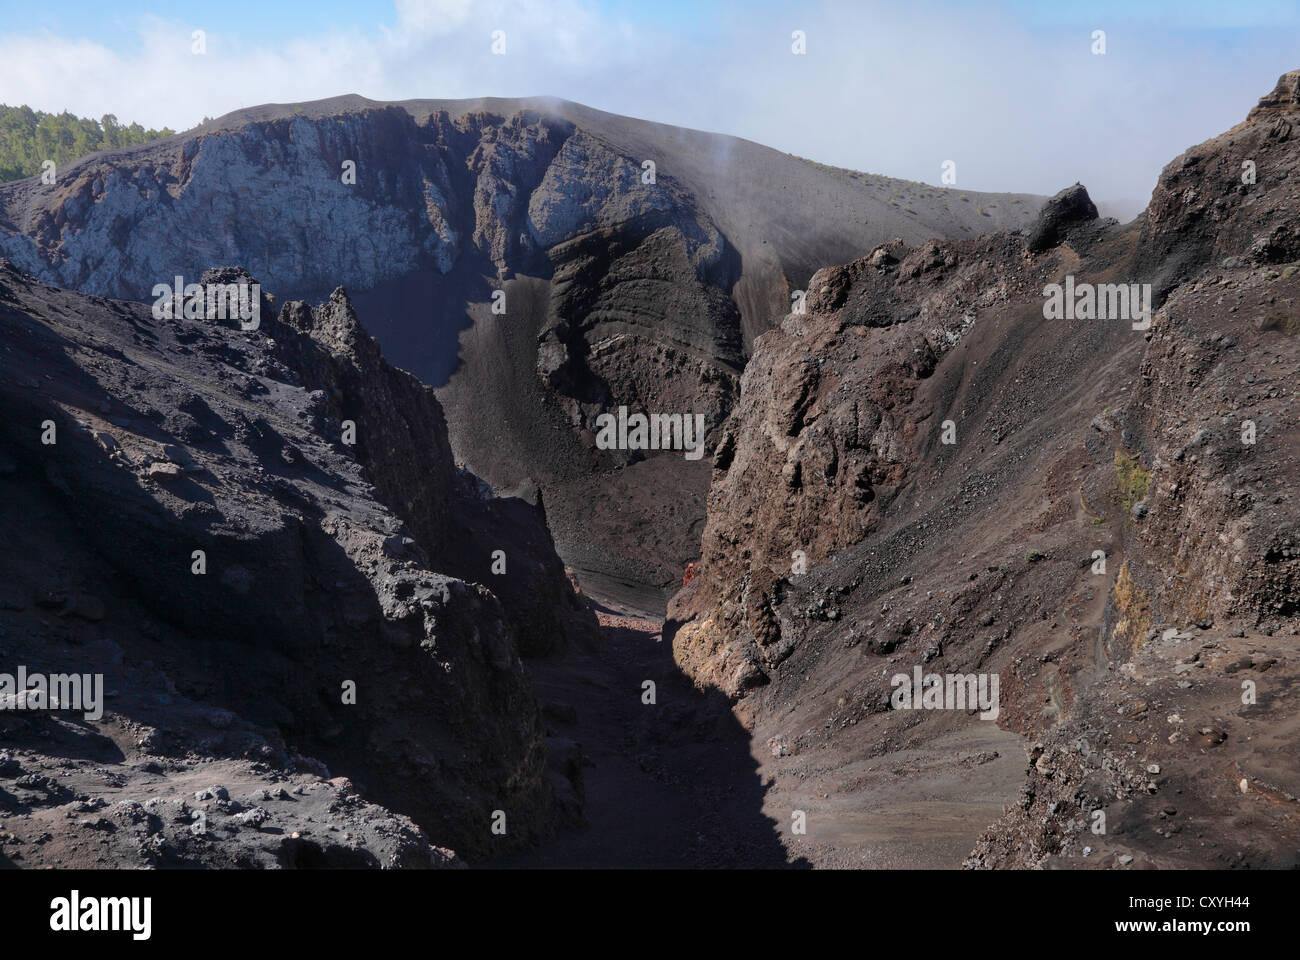 Crater of Hoyo Negro Volcano, Volcano Route, Ruta de los Volcanoes, La Palma, Canary Islands, Spain, Europe - Stock Image